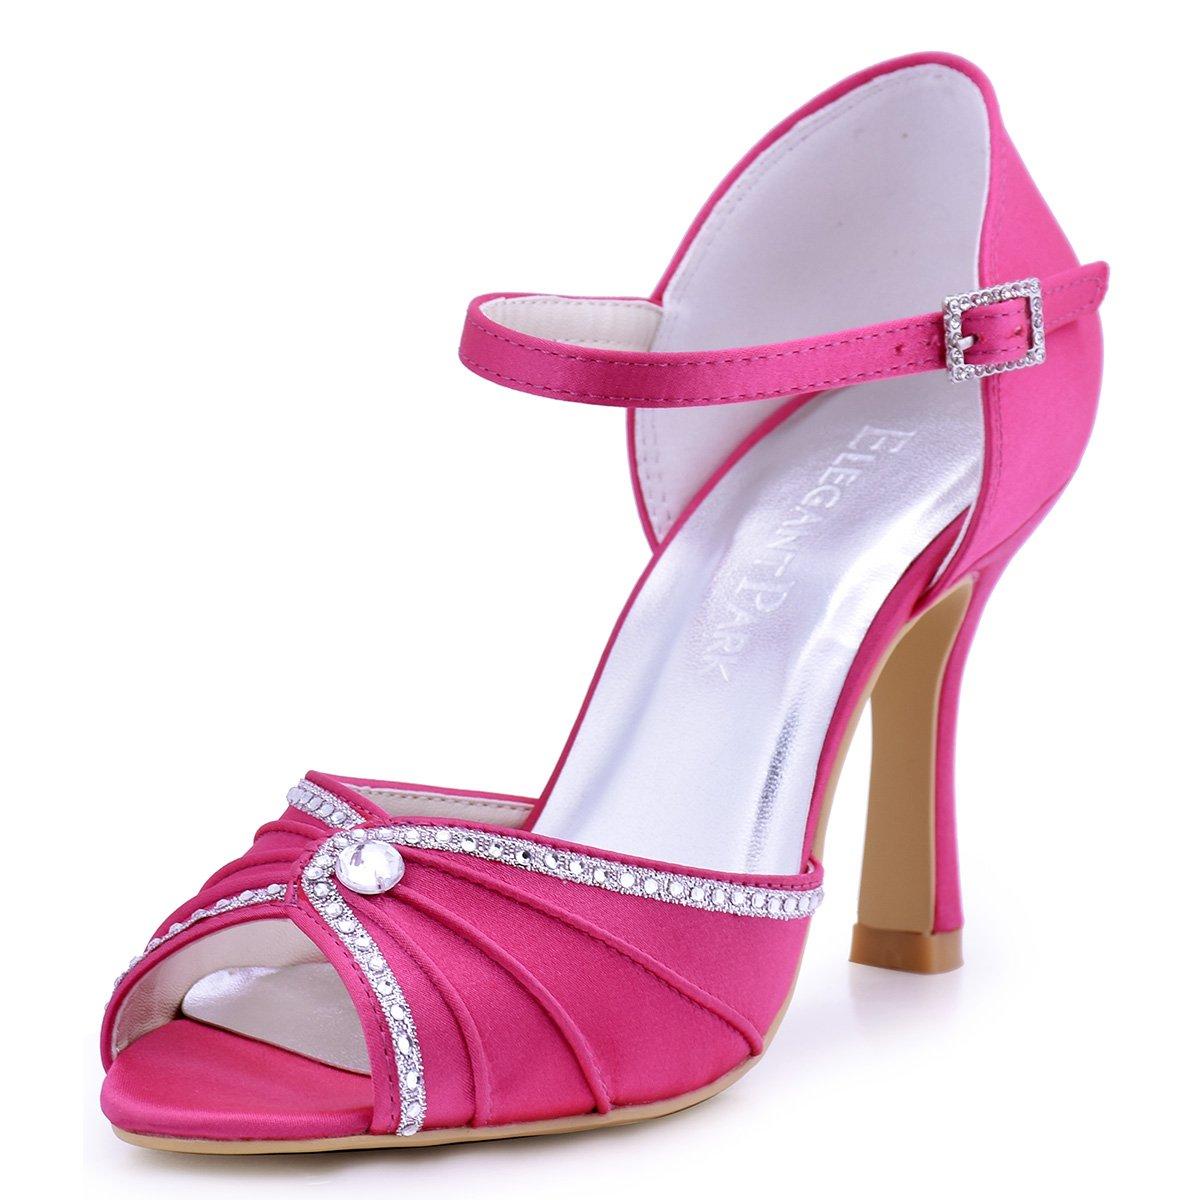 Amazon Elegantpark El033 Women's Pumps Peep Toe High Heels Pleated Rhinestones Satin Wedding Prom Shoes: Navy Dress For Wedding Shoes At Websimilar.org